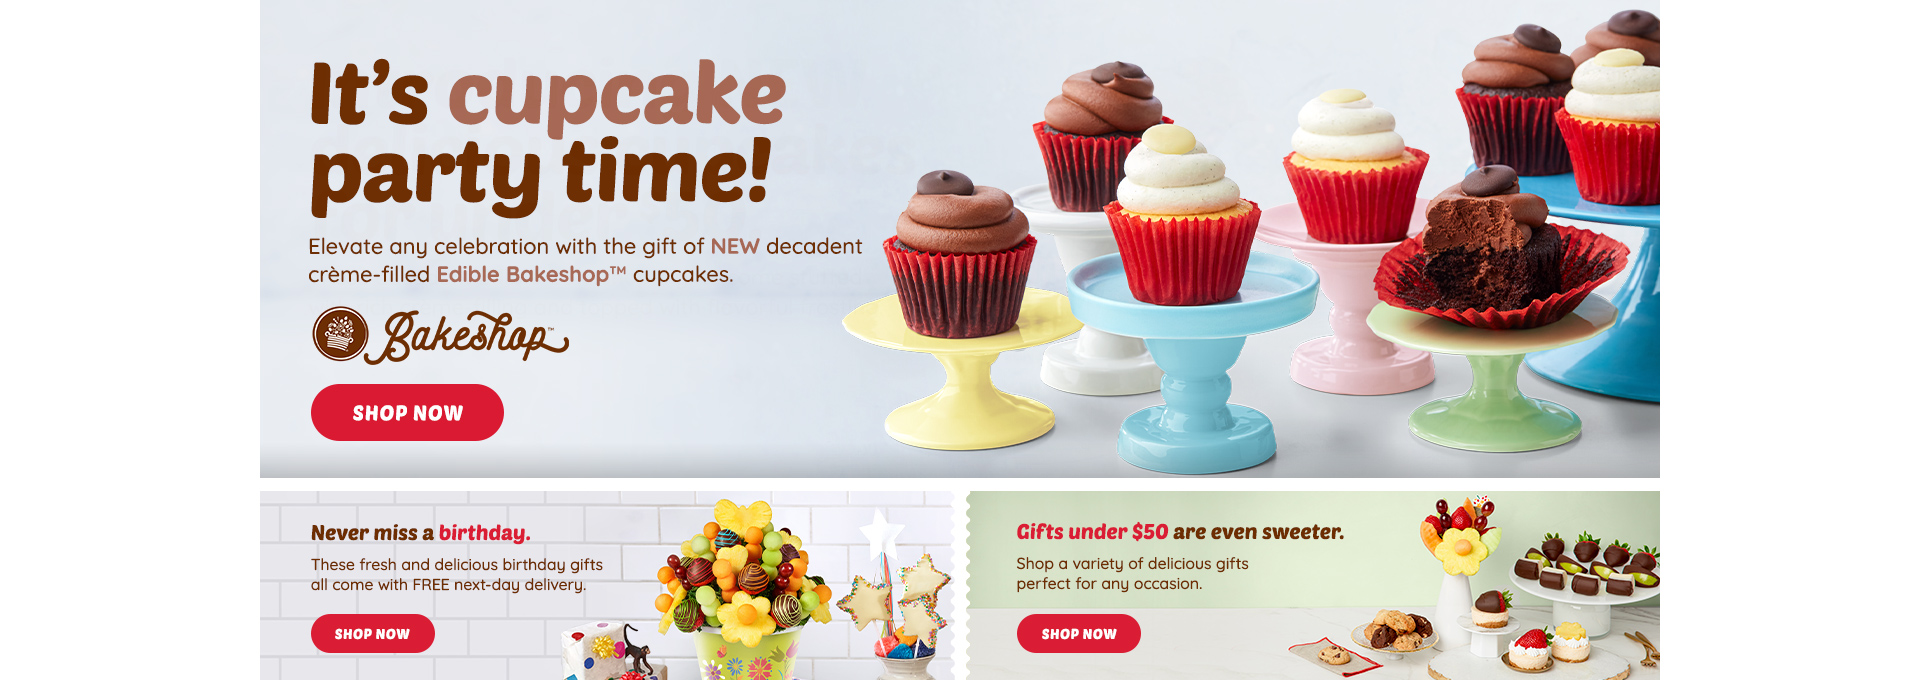 Cupcake launch desktop banner